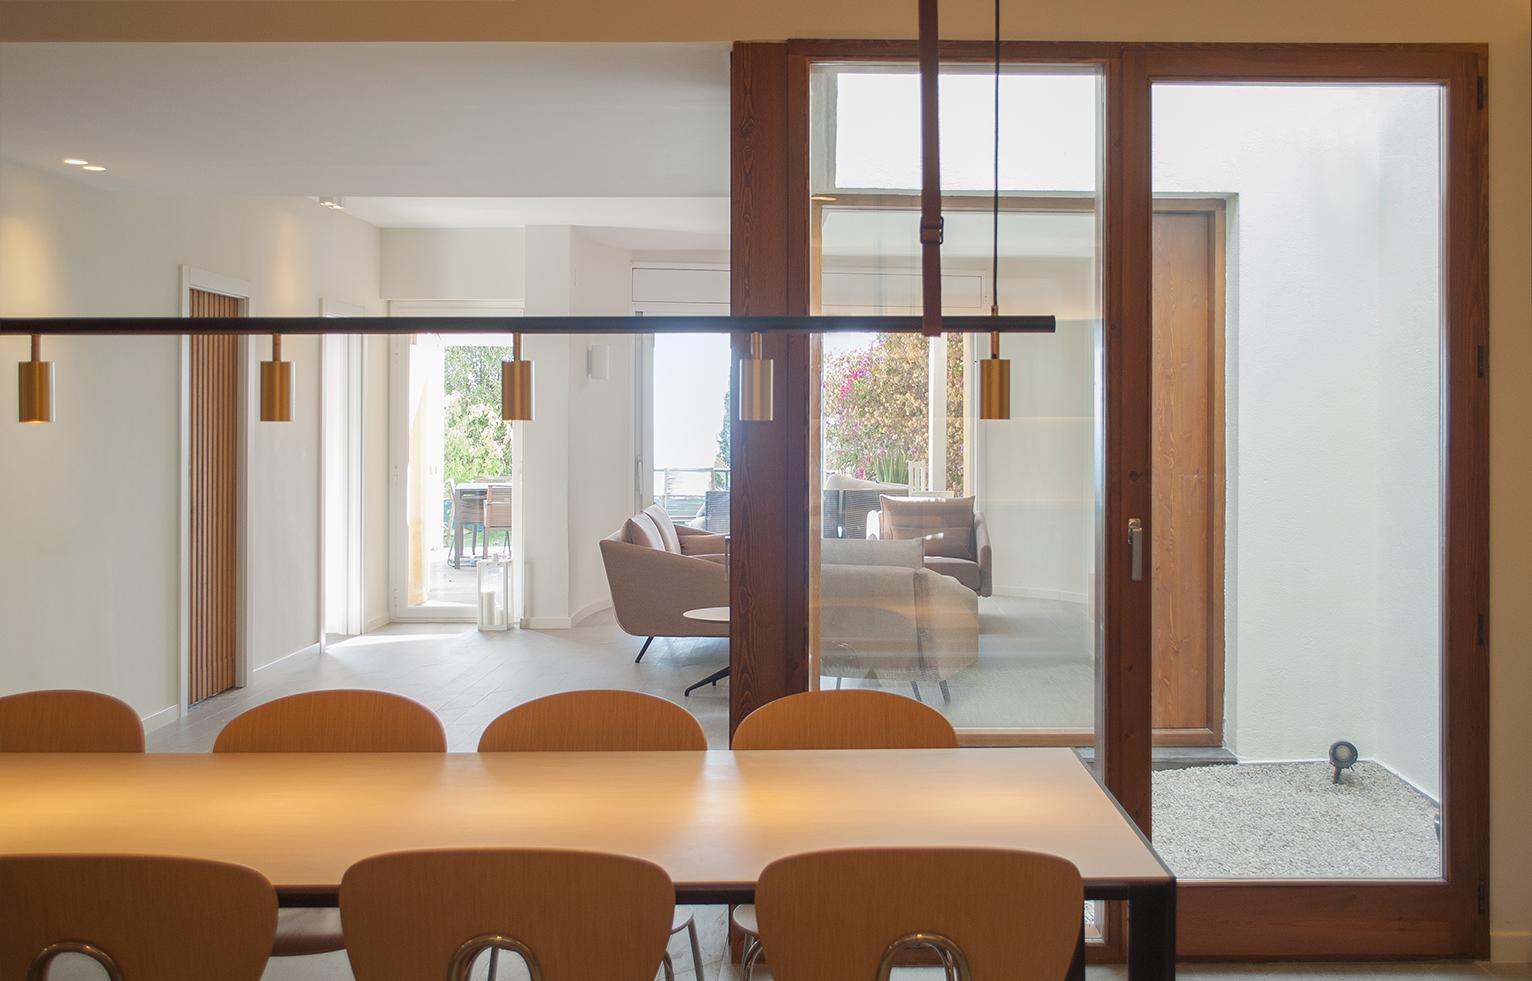 8-architecture-sitges-interior-design-barcelona-living-room-courtyard-lamp-stua-globus-deneb-costura-wood